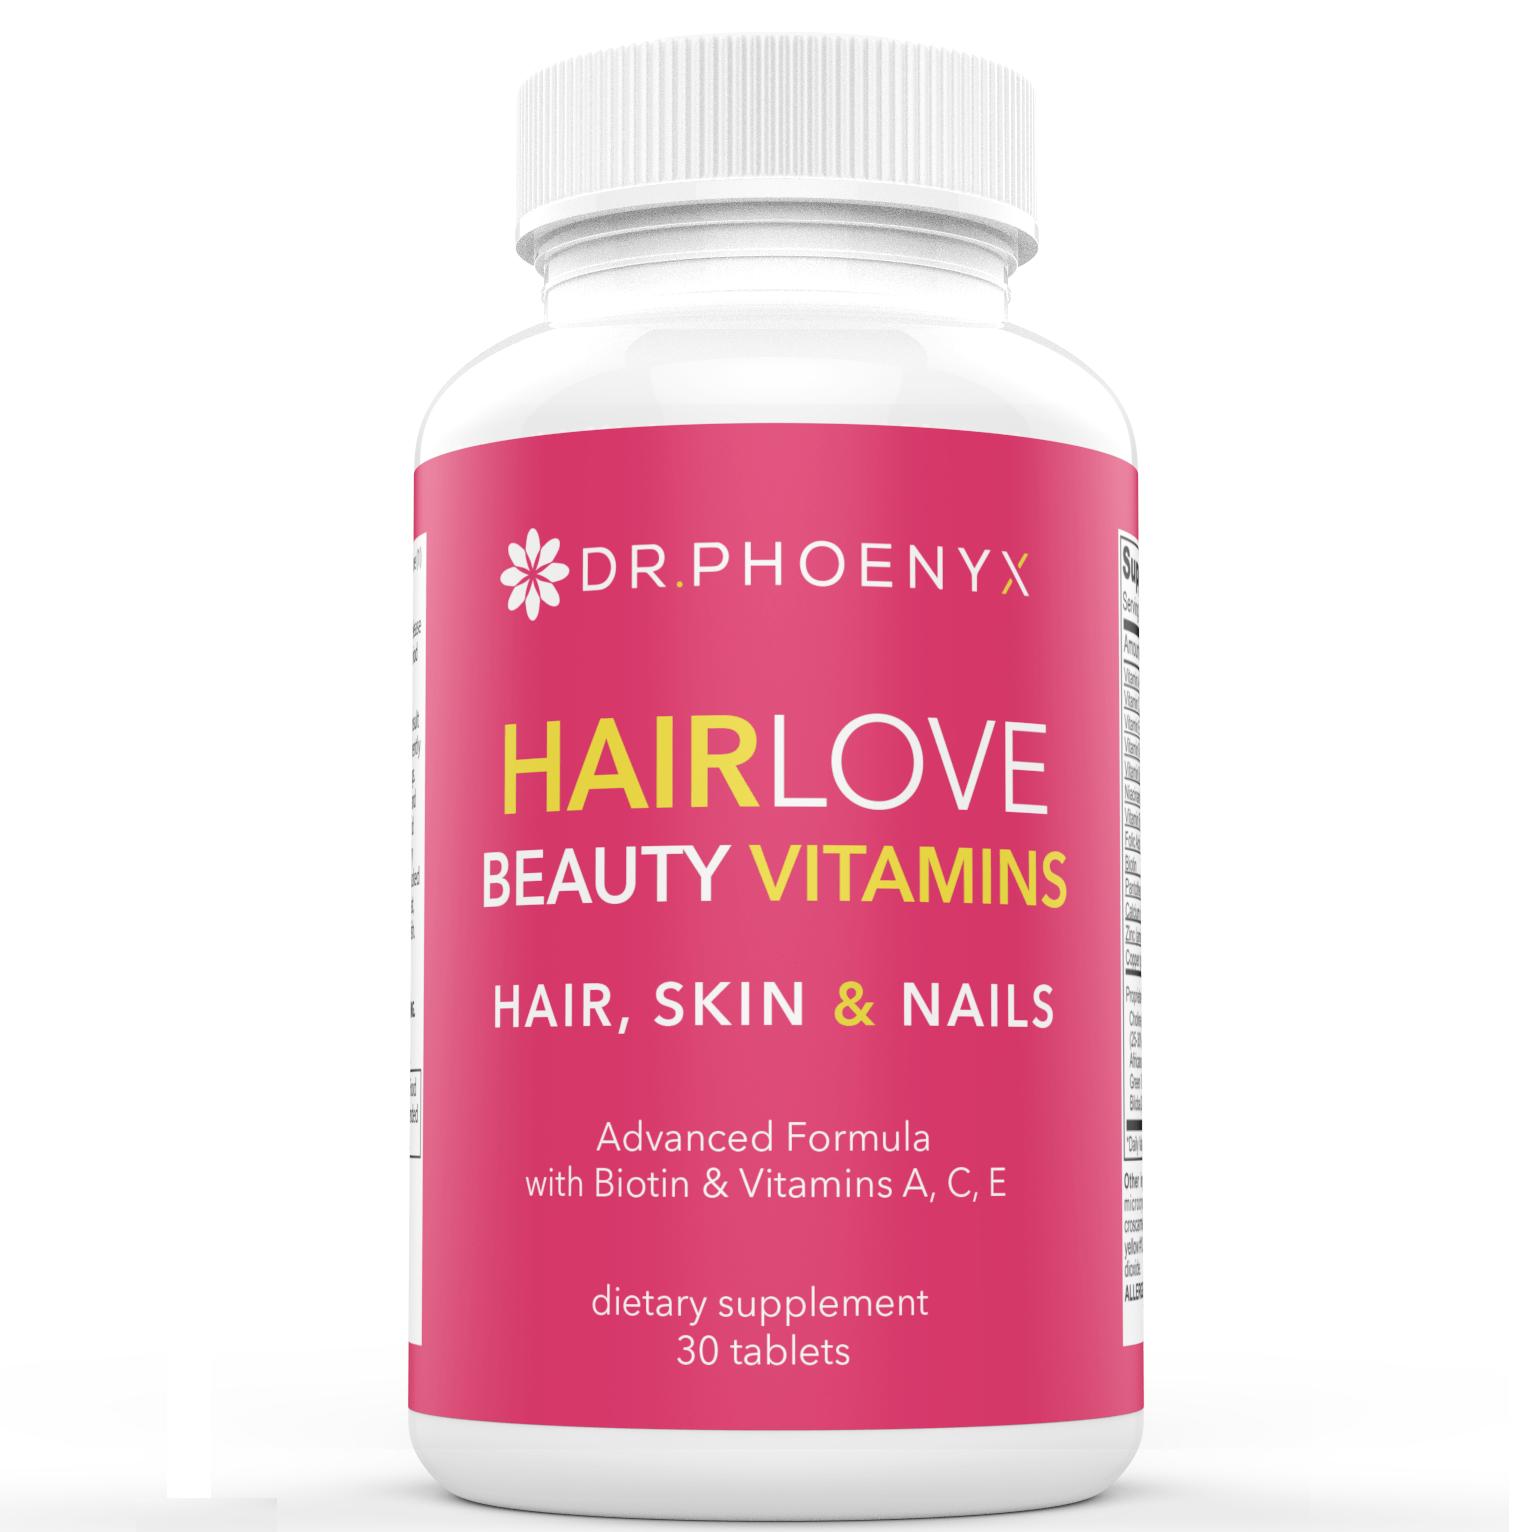 HairLove Healthy Hair, Skin and Nails Vitamins | Dr. Phoenyx